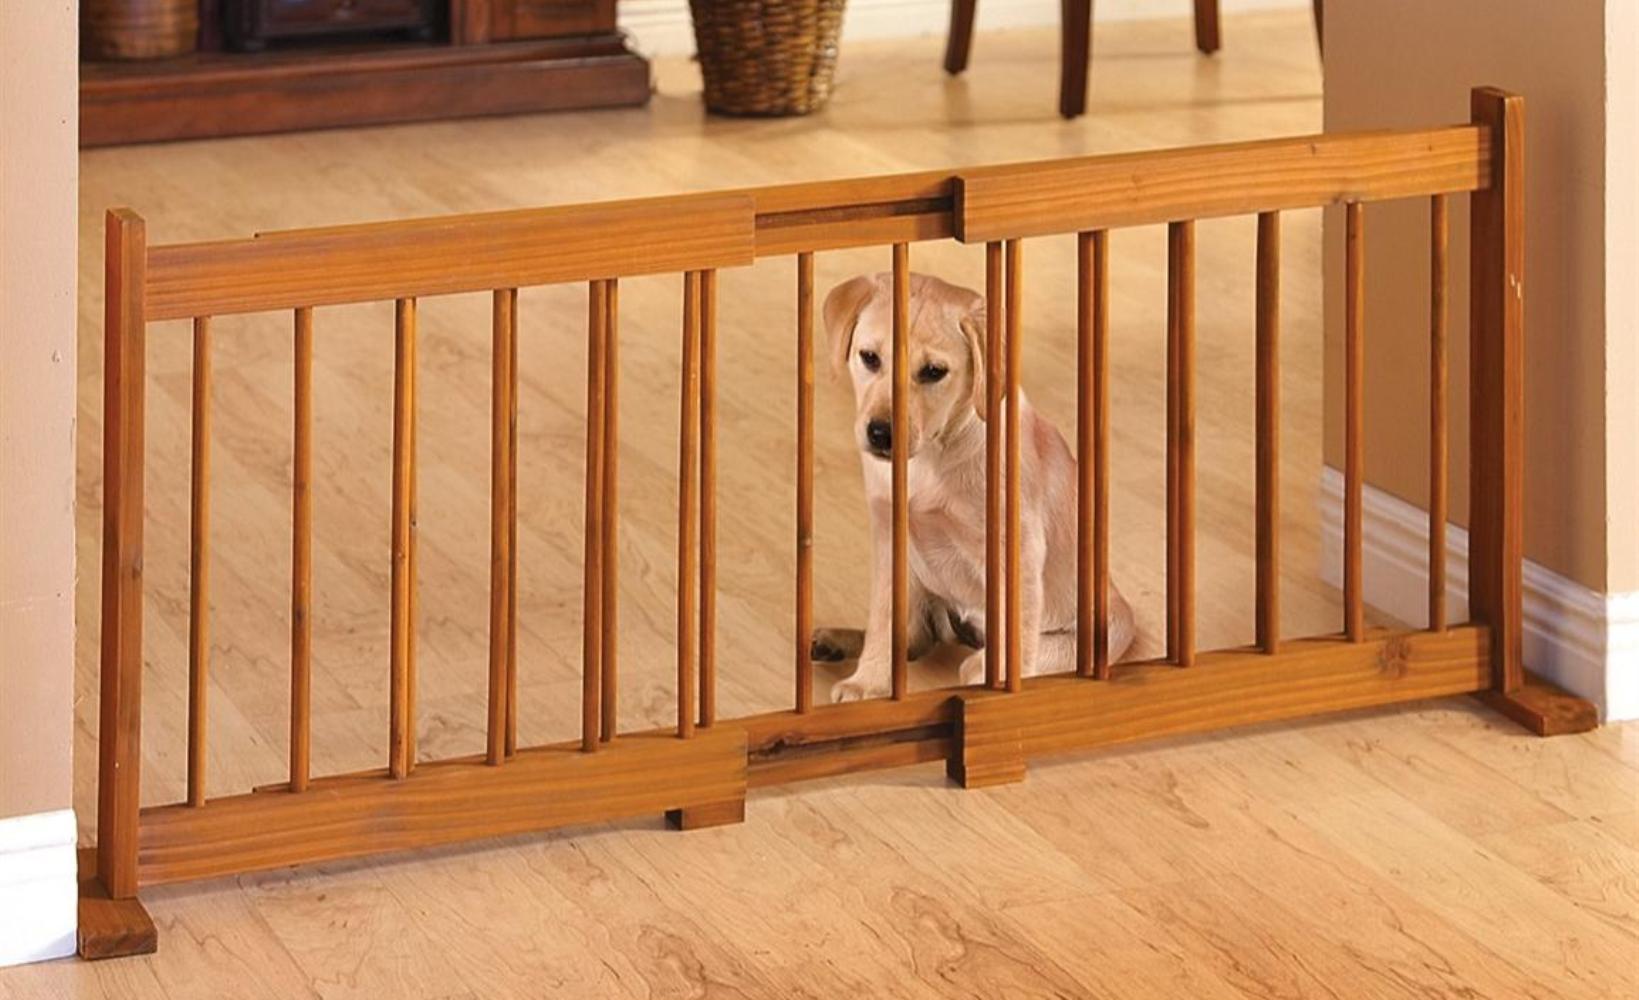 58 Expandable Pet Gate Adjustable Wood Dog Gates Indoor